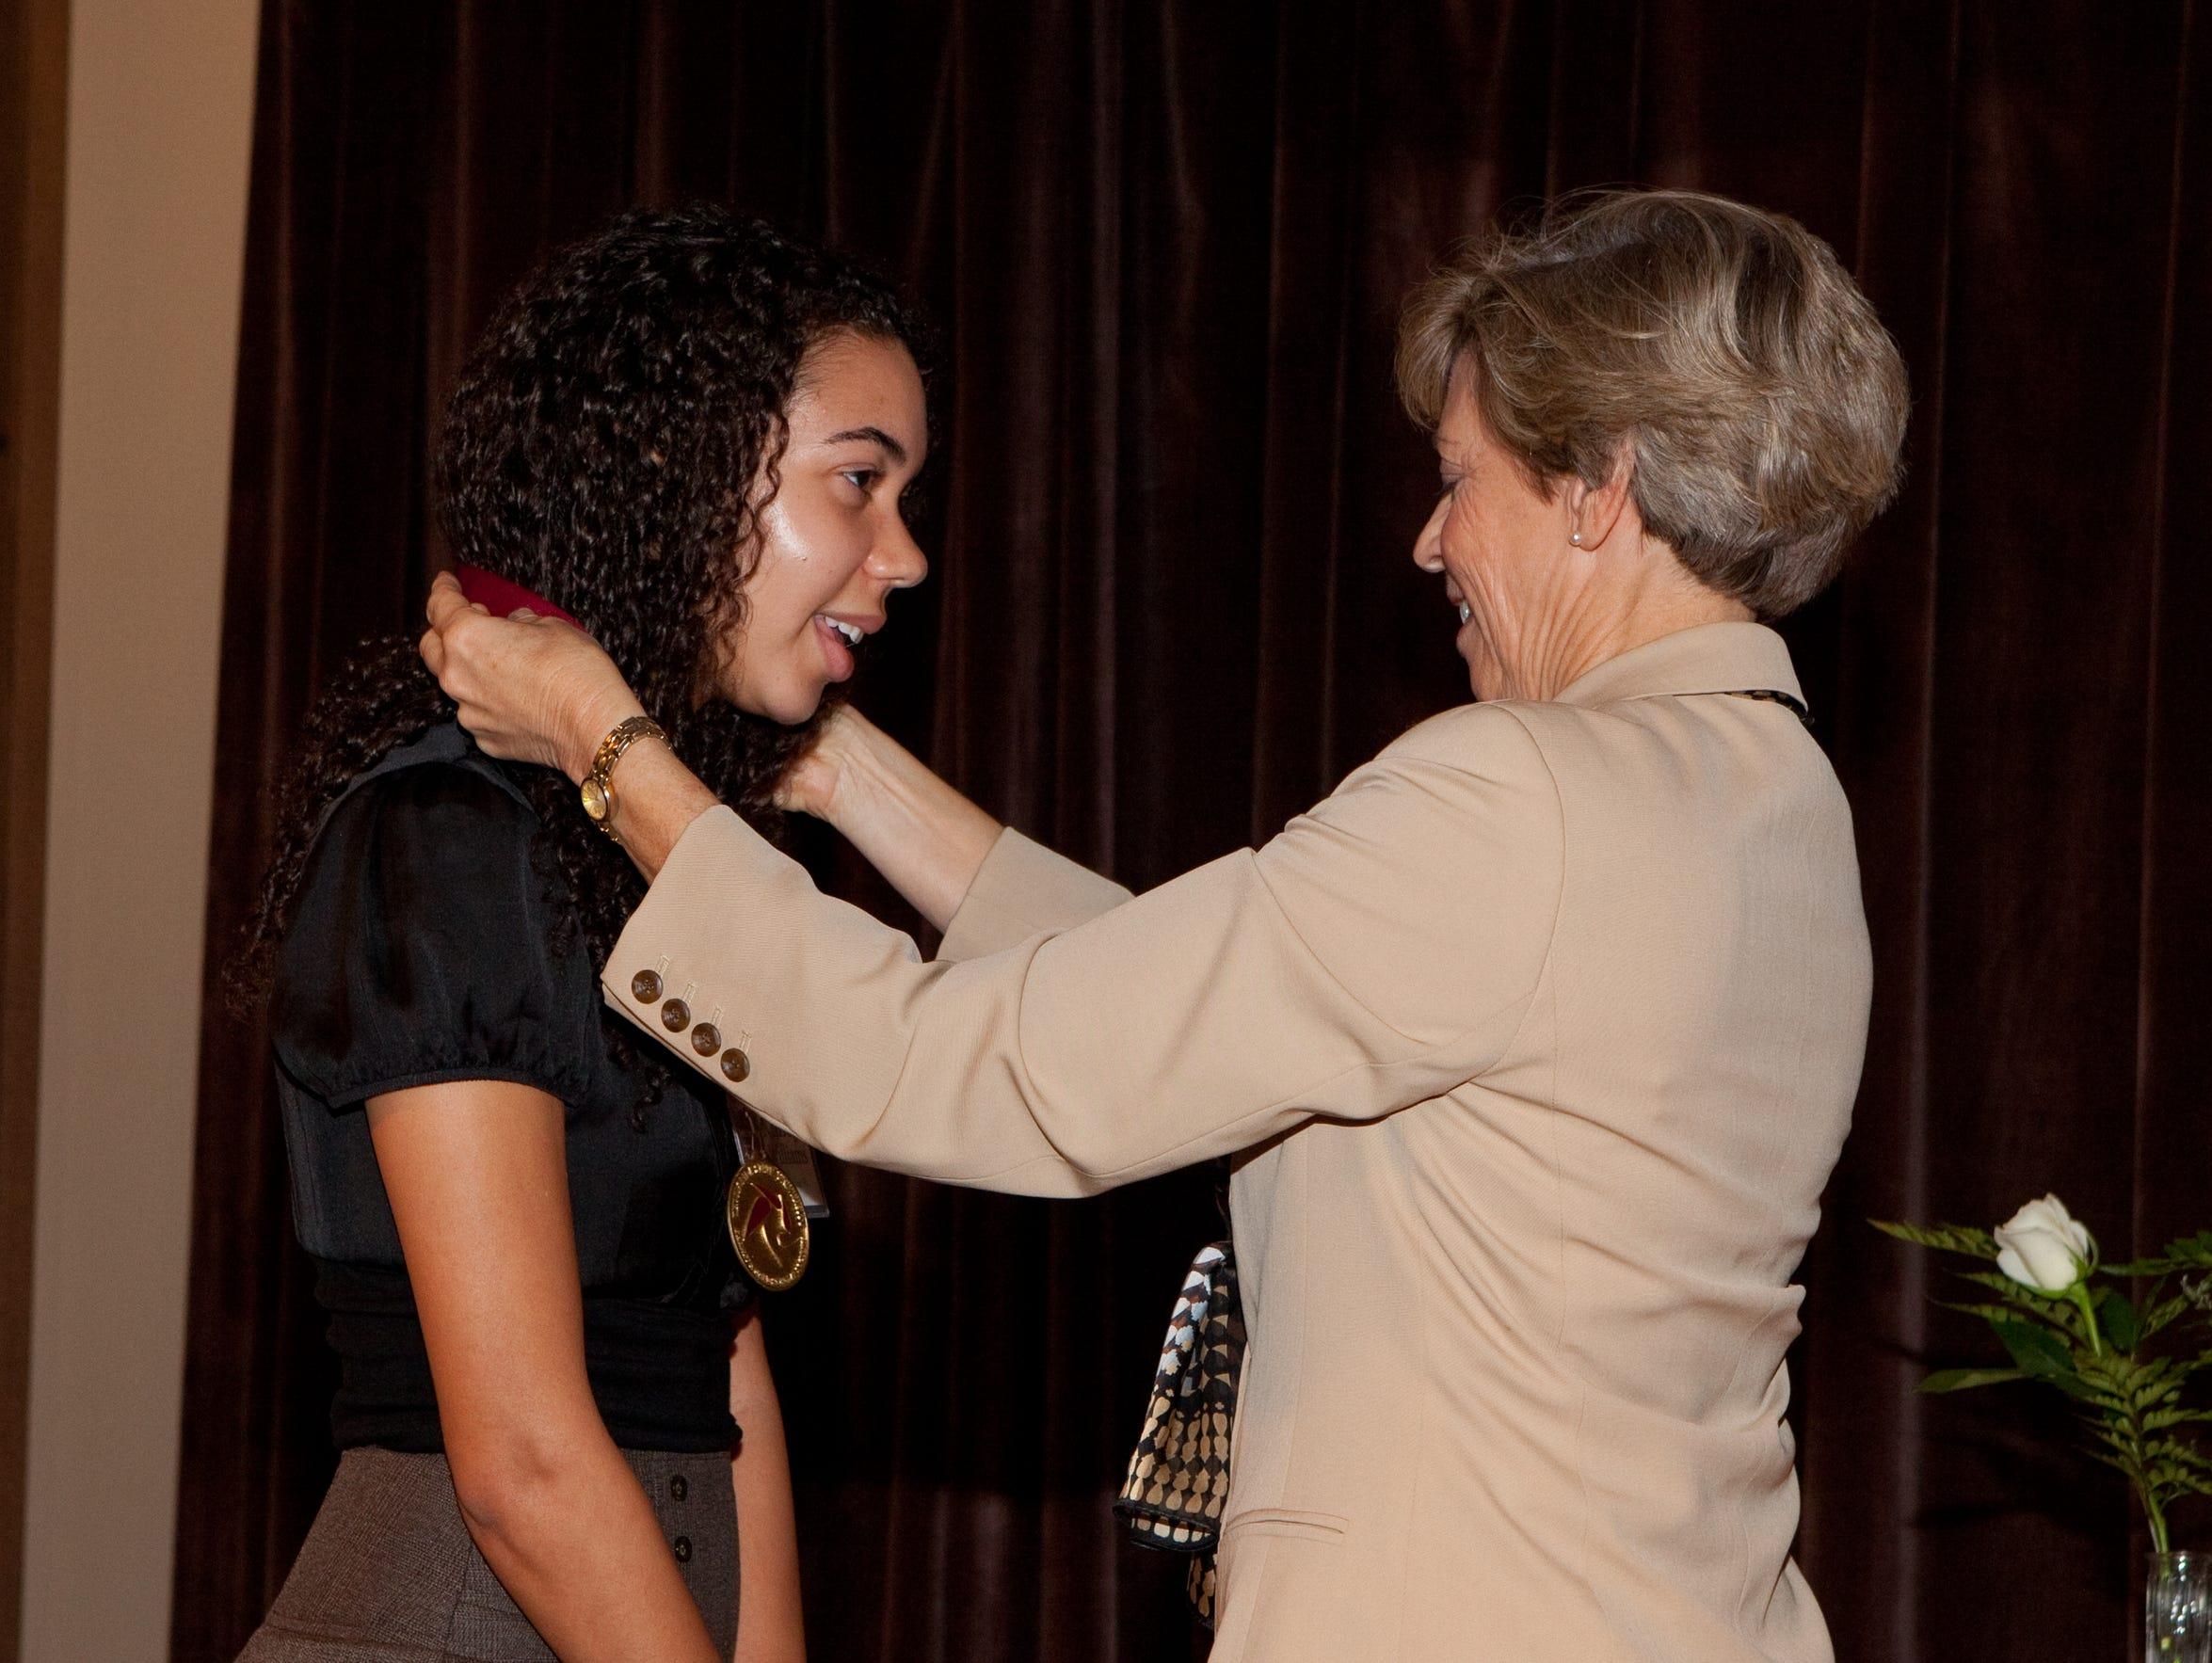 Kimora Williams, left, is presented the Garnet and